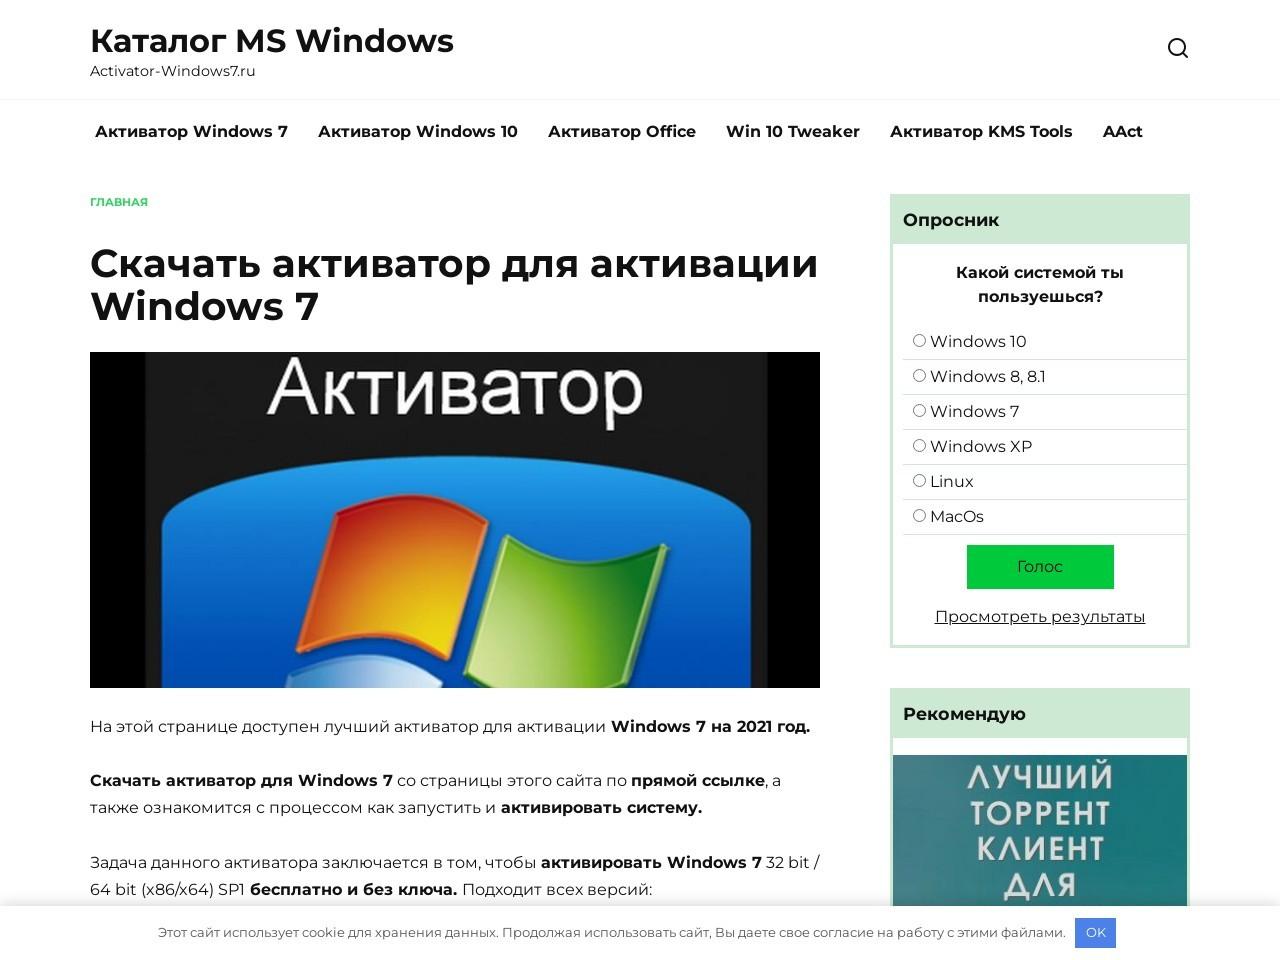 х64 7 активатор windows максимальная